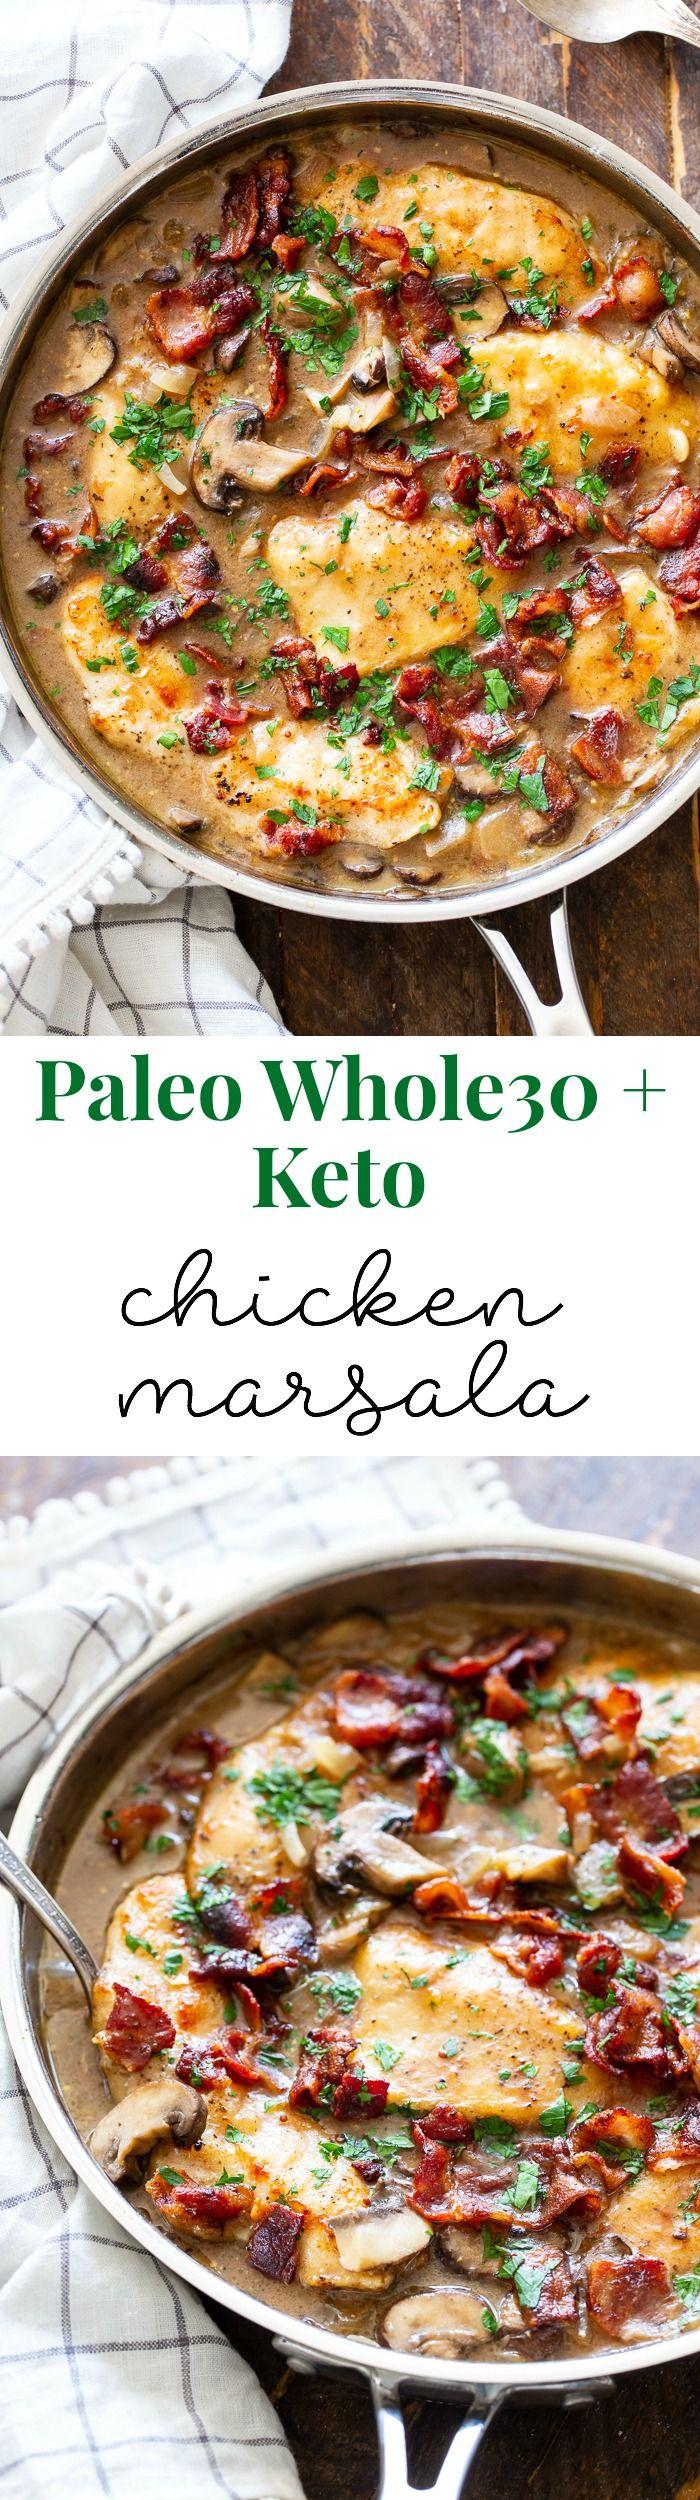 Chicken Marsala with Bacon (Paleo, Whole30, Keto)